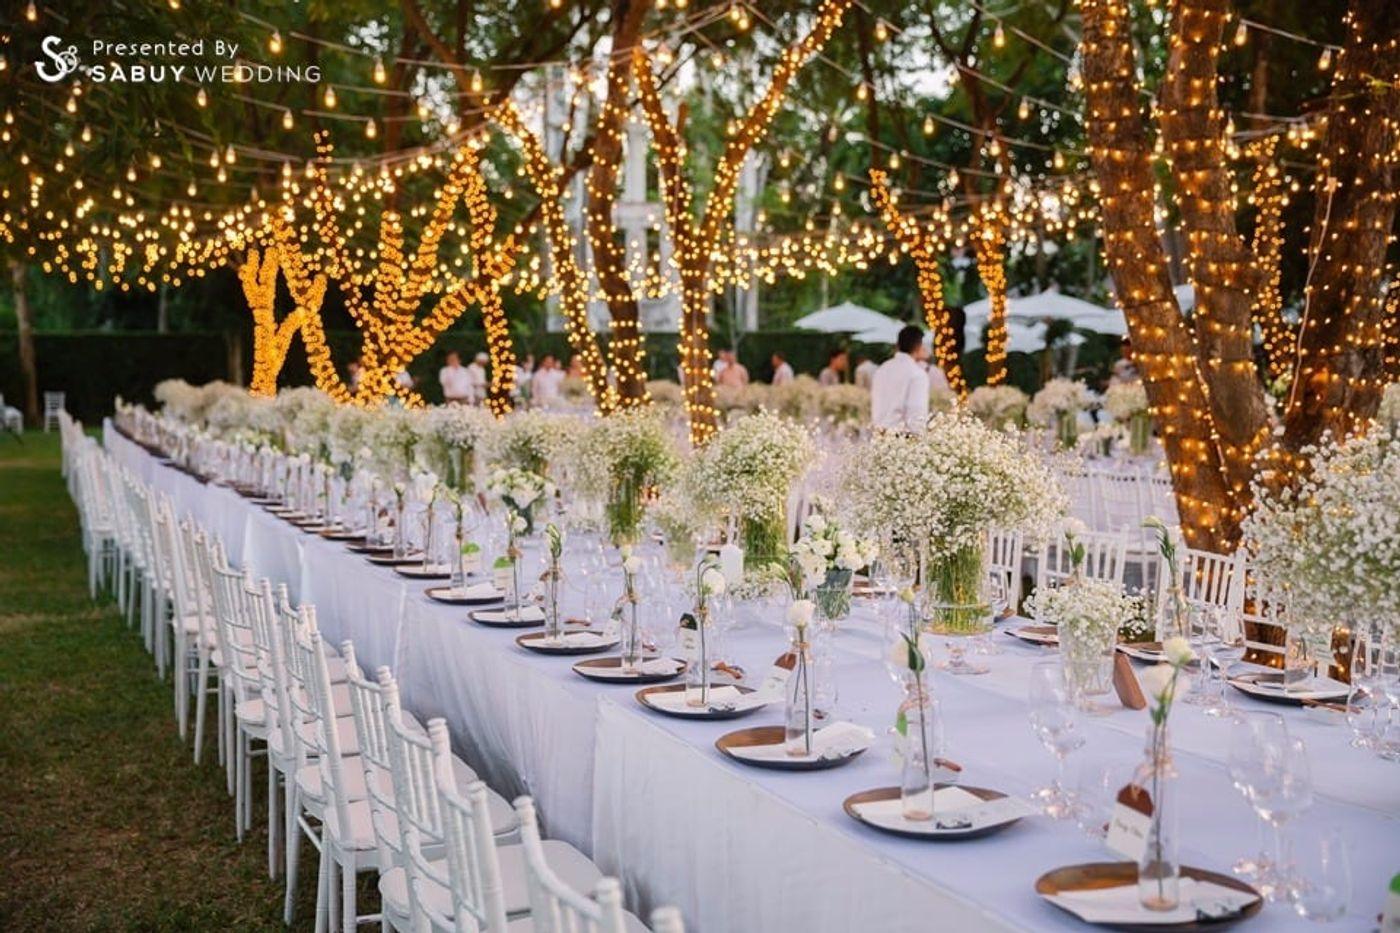 long-table,ตกแต่งงานแต่ง,จัดดอกไม้งานแต่ง รีวิวงานแต่งอิ่มใจไปกับงานหมั้นล้านนา ปิดท้าย Sit-down dinner ประดับไฟแสนสวยในสวนหลังบ้าน